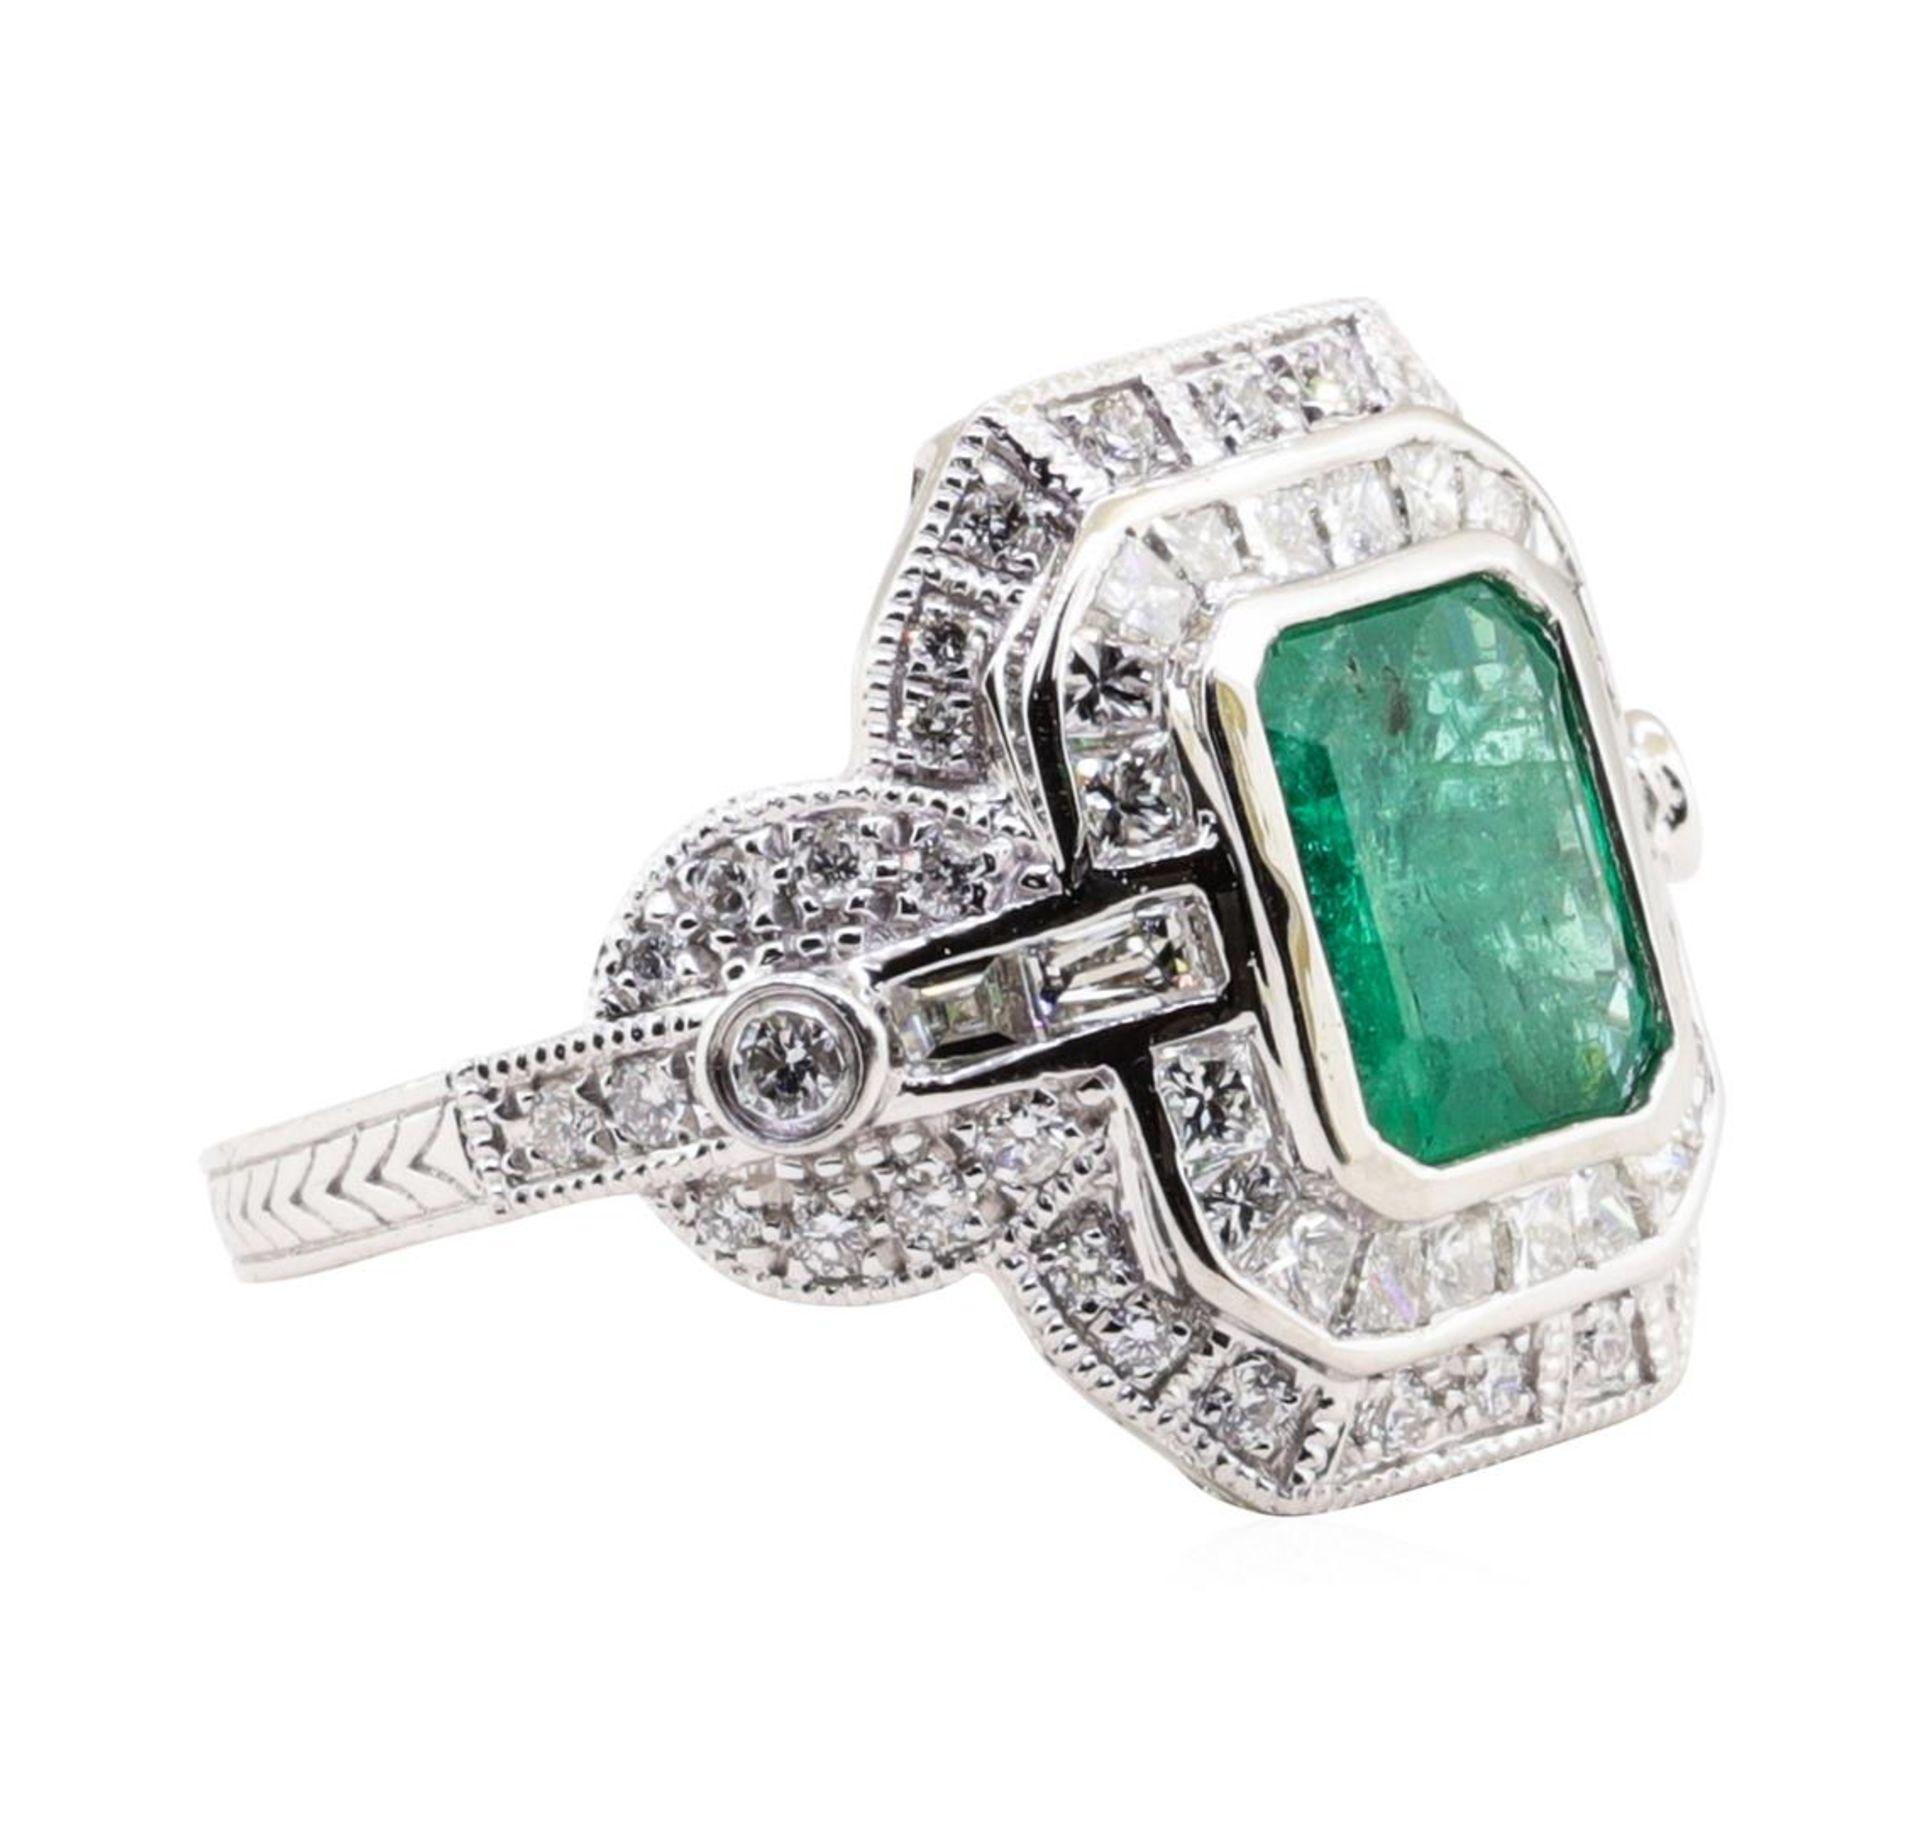 1.94ct Emerald and Diamond Ring - Platinum - Image 2 of 5